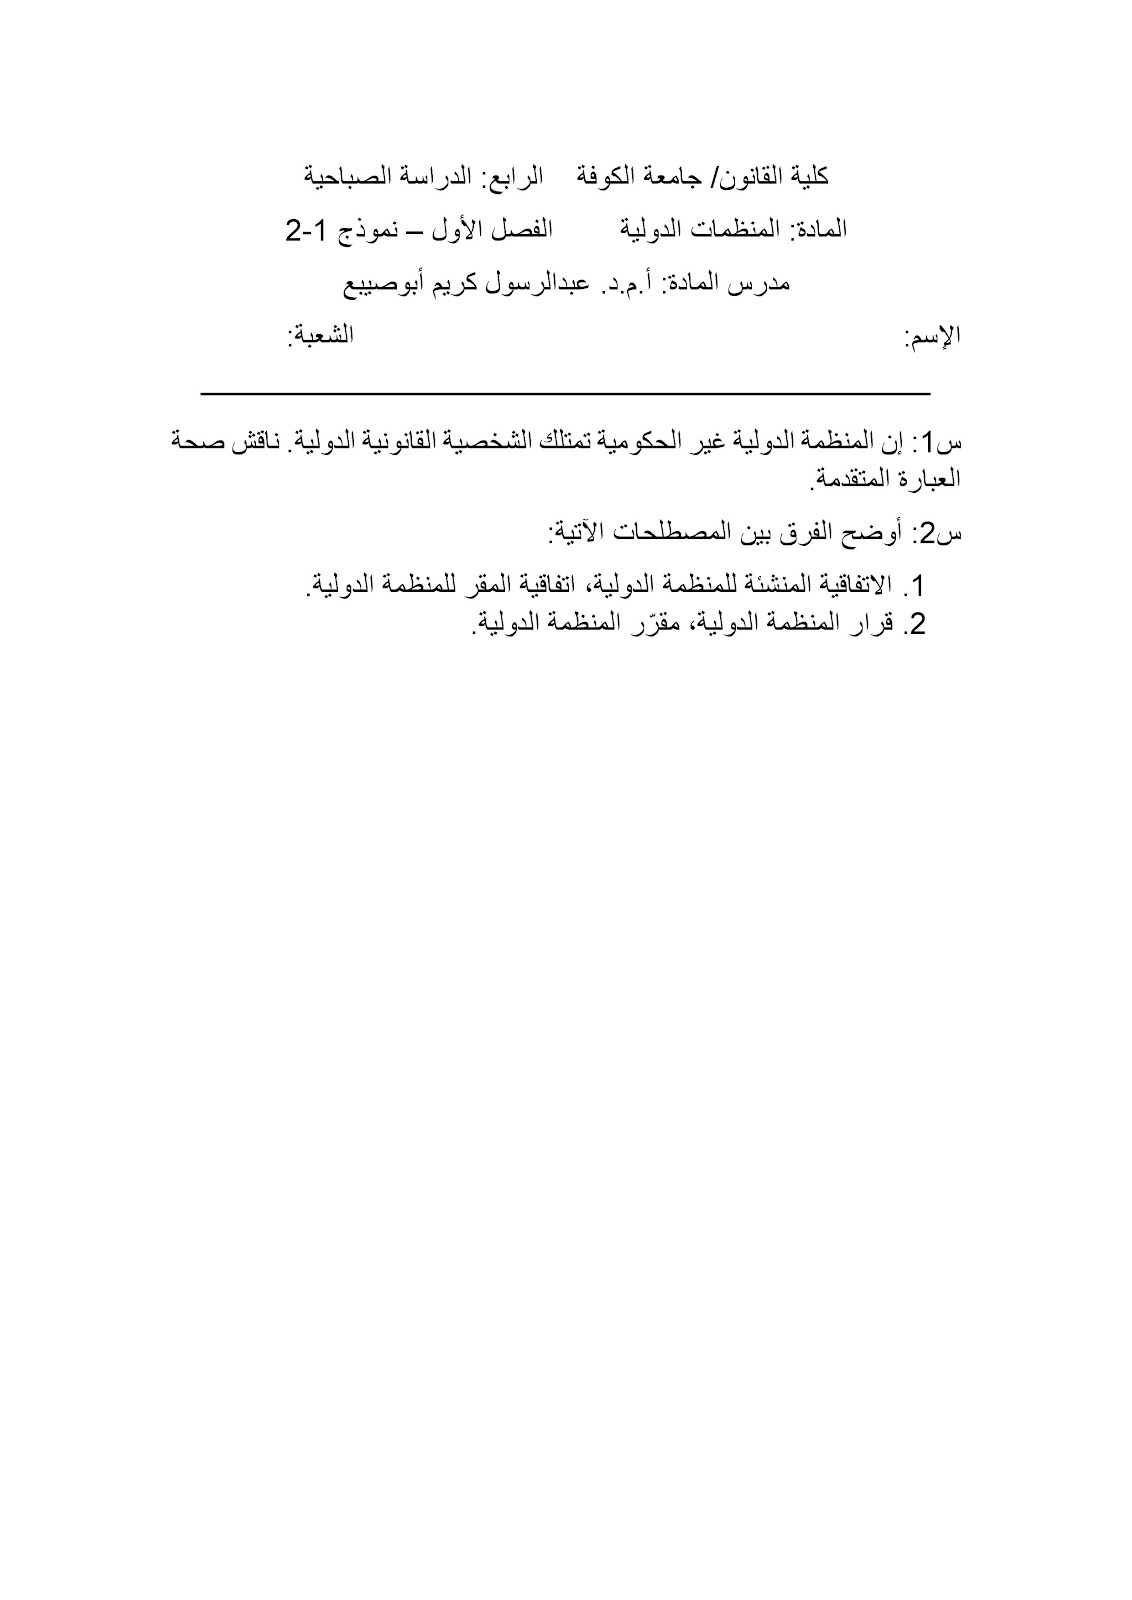 4.page1.jpg